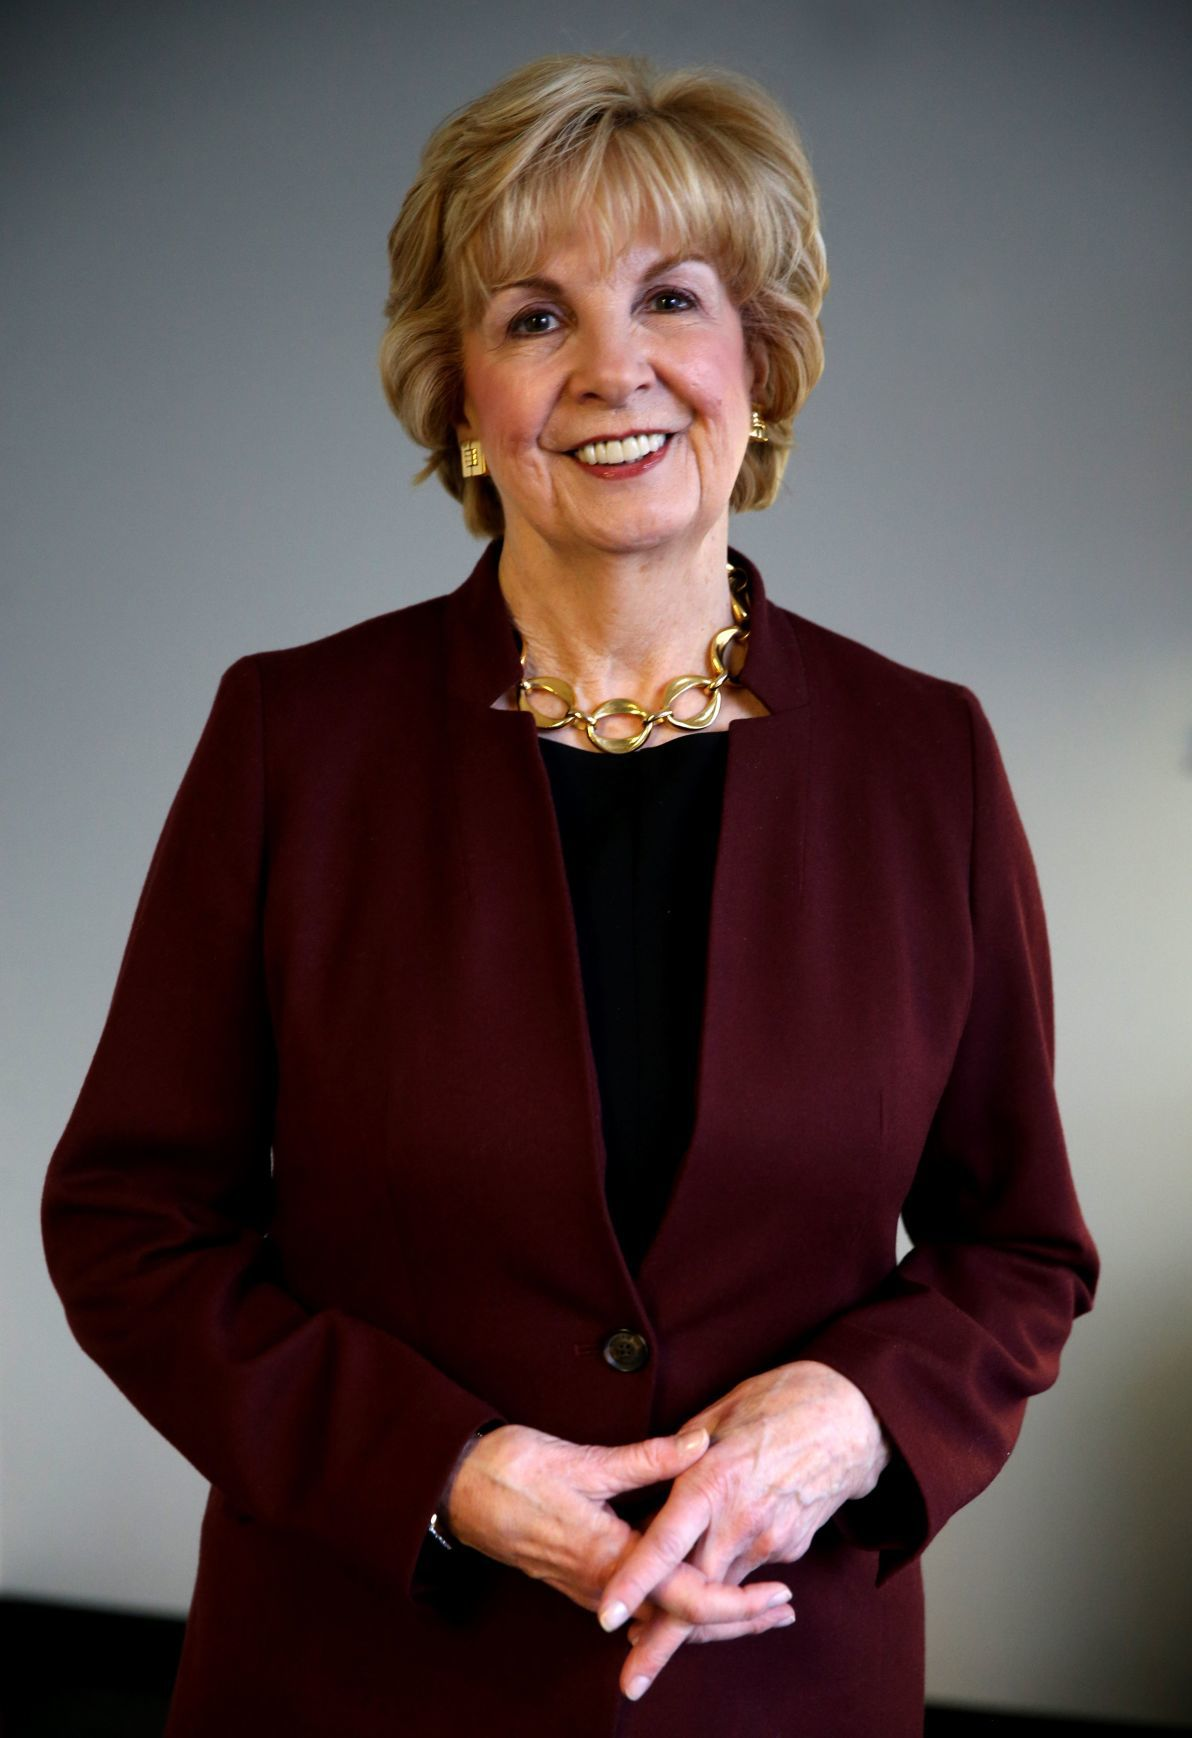 Kathy Osborn, head of Regional Business Council, named